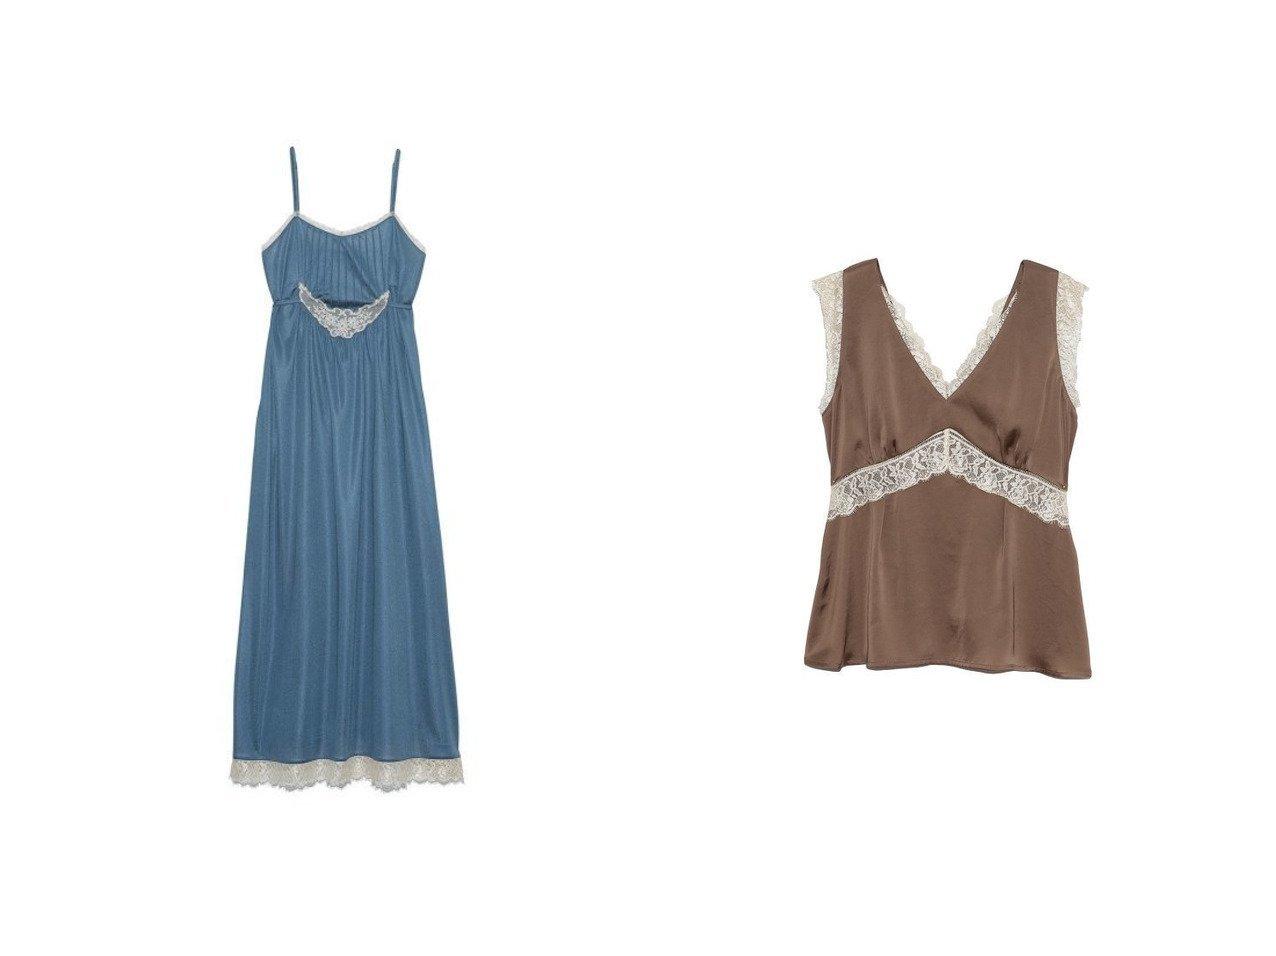 【Lily Brown/リリーブラウン】のヴィンテージサテンキャミOP&ヴィンテージサテントップス Lily Brownのおすすめ!人気、トレンド・レディースファッションの通販 おすすめで人気の流行・トレンド、ファッションの通販商品 メンズファッション・キッズファッション・インテリア・家具・レディースファッション・服の通販 founy(ファニー) https://founy.com/ ファッション Fashion レディースファッション WOMEN ワンピース Dress トップス Tops Tshirt キャミソール / ノースリーブ No Sleeves アンダー アンティーク キャミワンピース ストレッチ ラップ レース 再入荷 Restock/Back in Stock/Re Arrival  ID:crp329100000019630